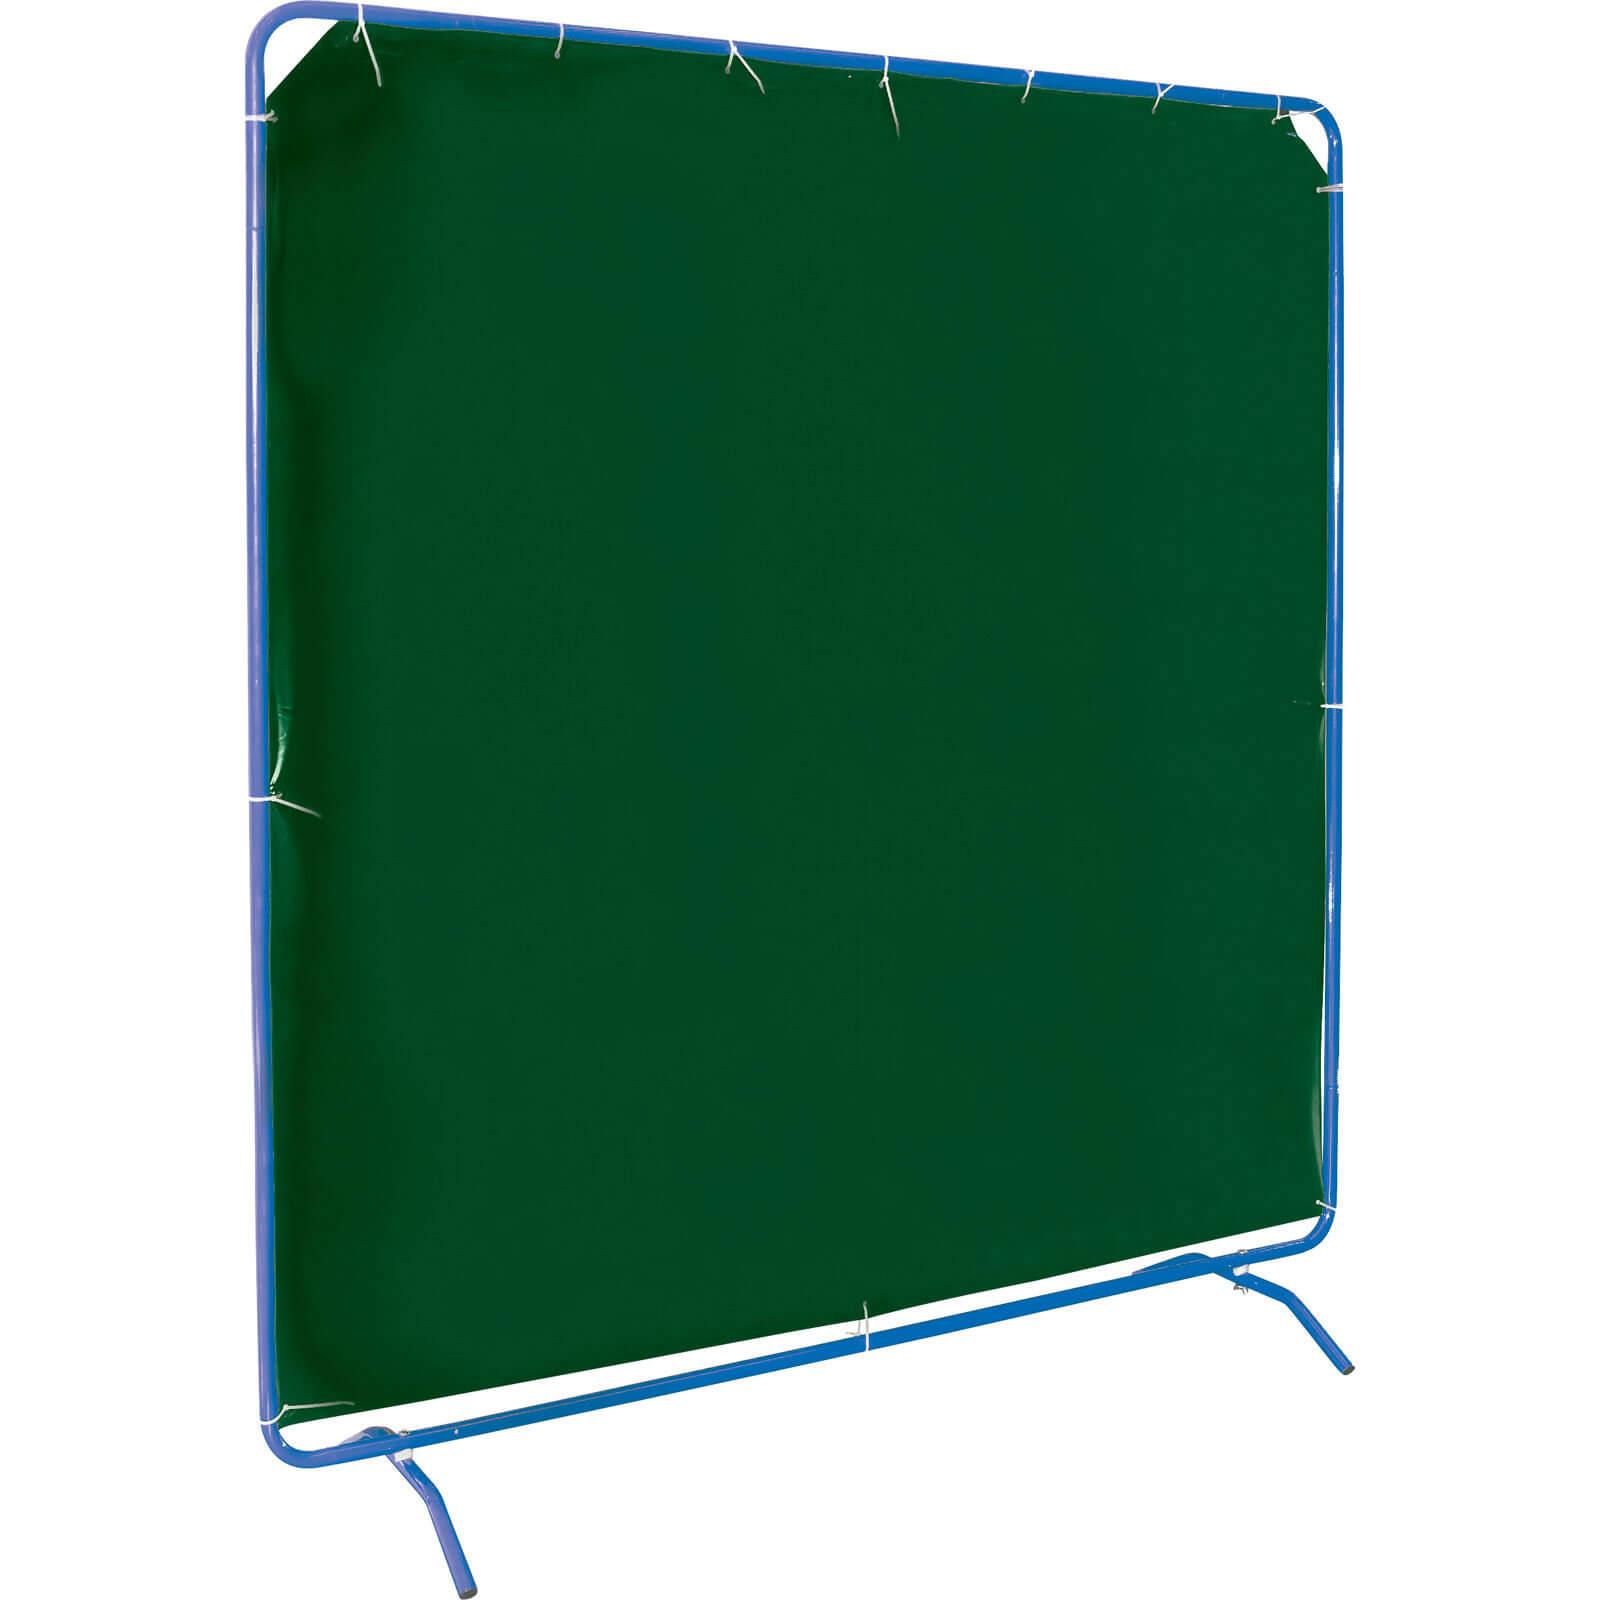 Image of Draper Welding Curtain